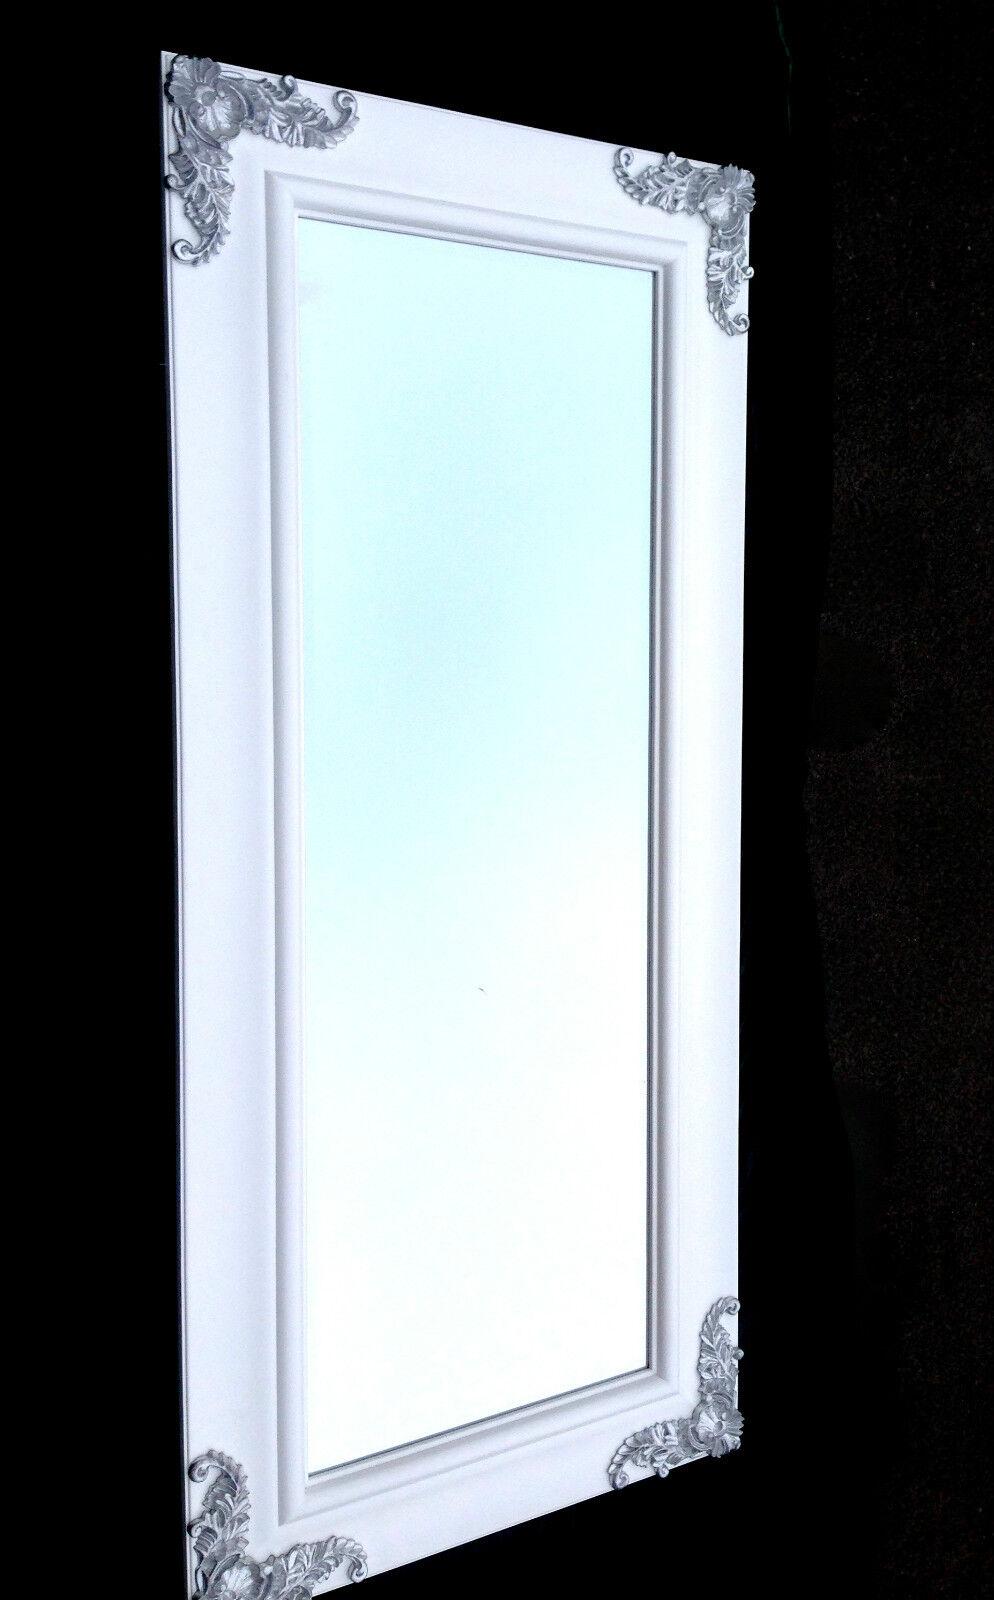 xxl wandspiegel wei silber 180x80 wei friseurspiegel flur spiegel gro kaufen bei pintici. Black Bedroom Furniture Sets. Home Design Ideas